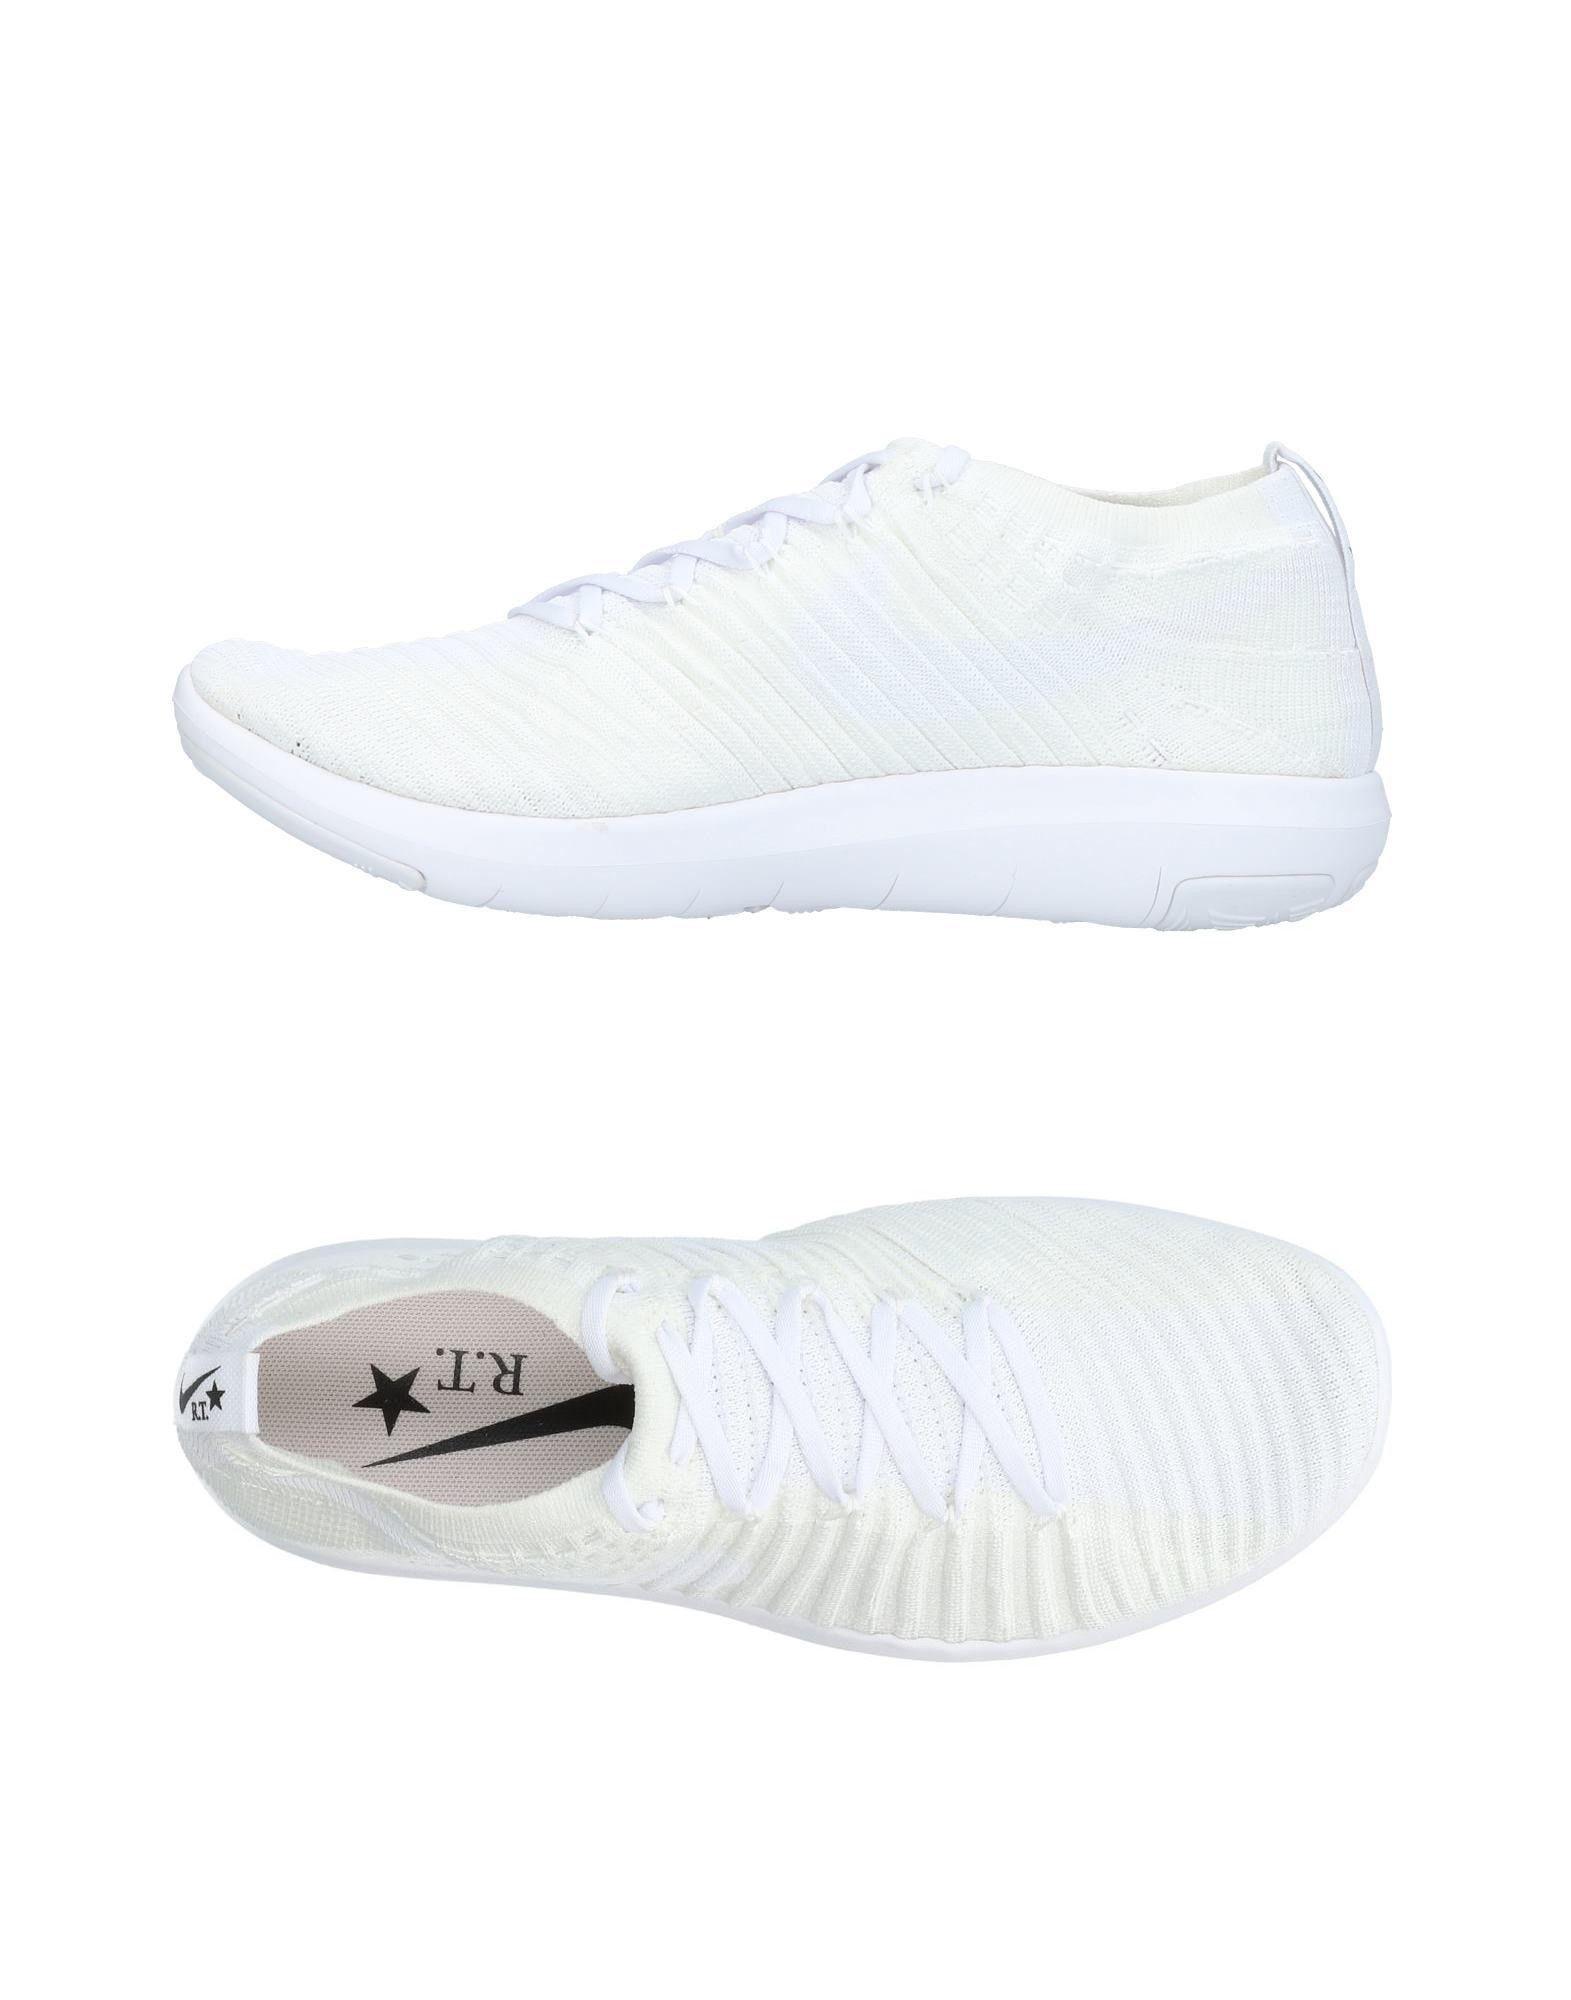 Nike Sneakers Damen  11429498HA Gute Qualität beliebte Schuhe